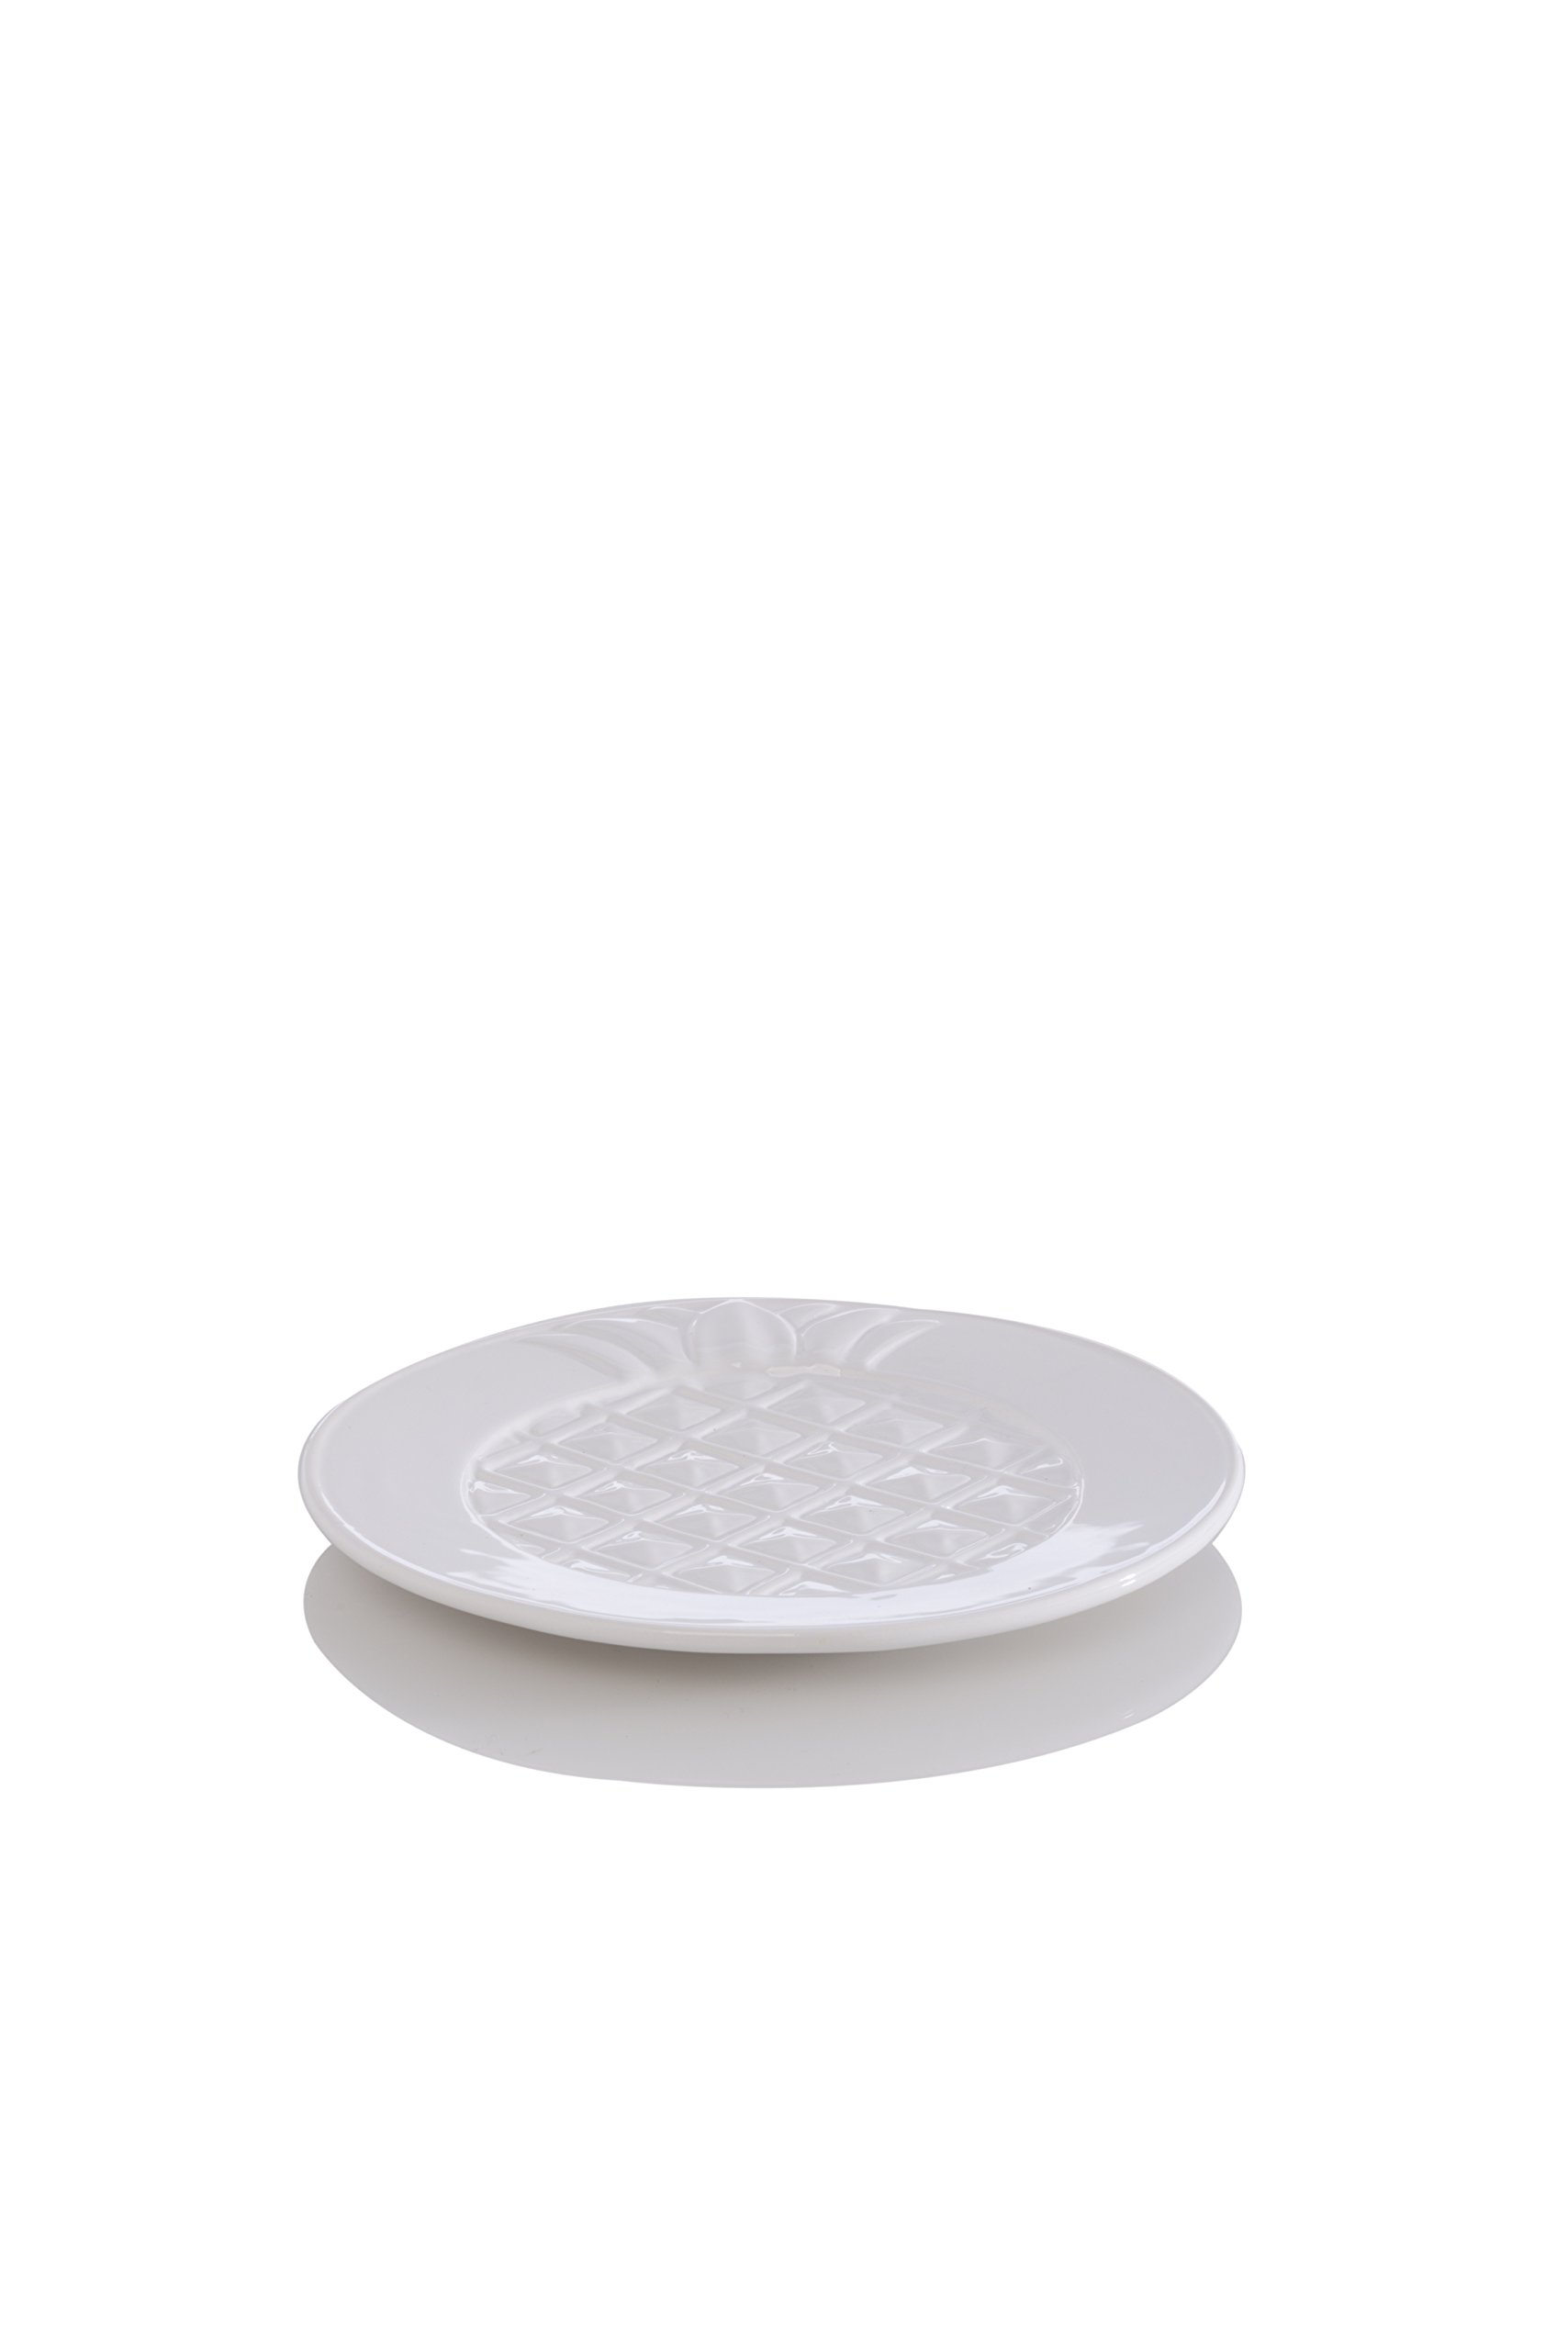 Shiraleah Pineapple Dessert Plate, White